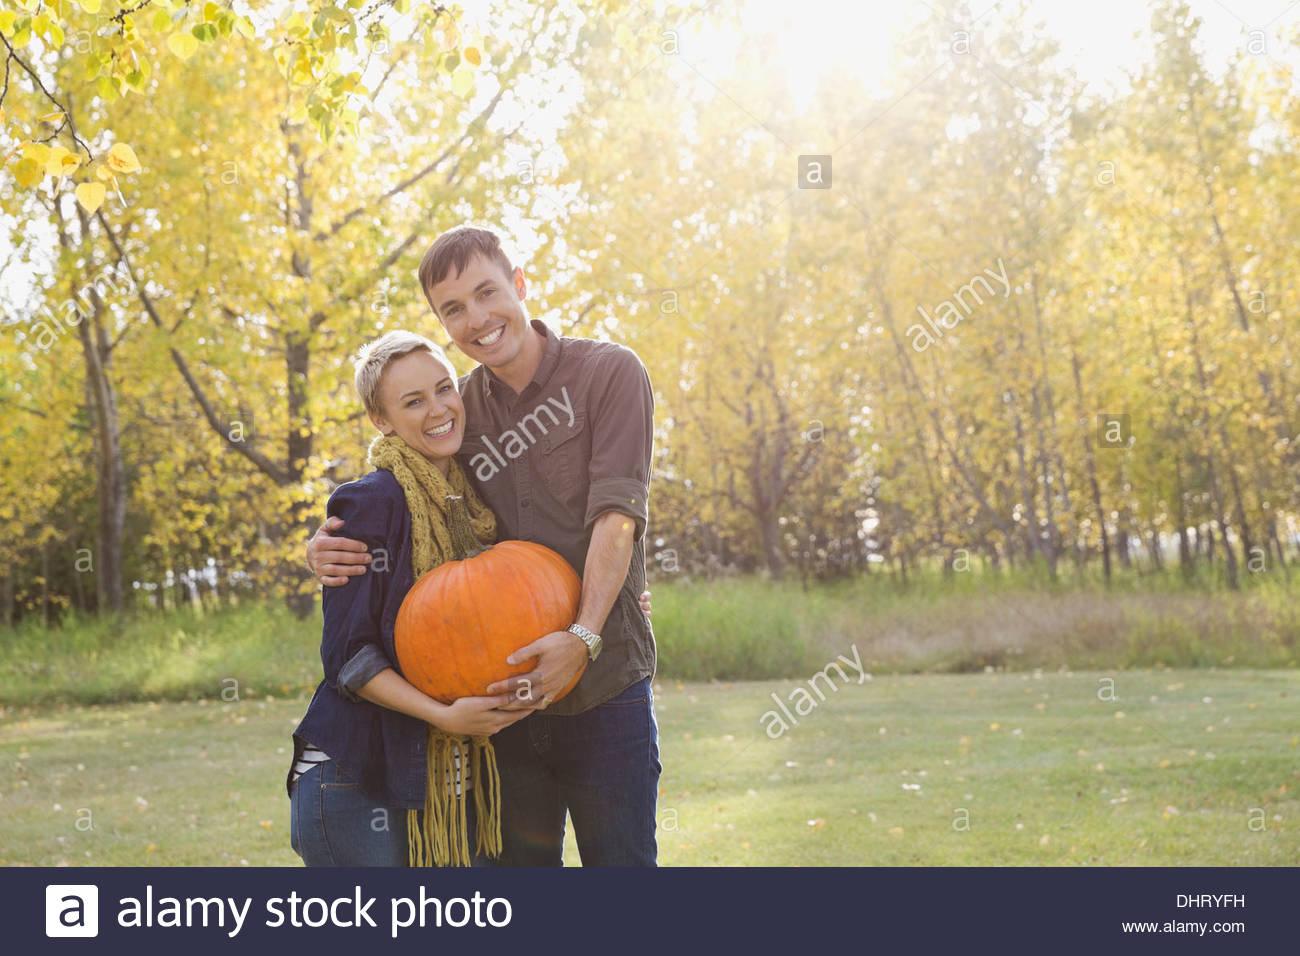 Happy couple holding pumpkin - Stock Image